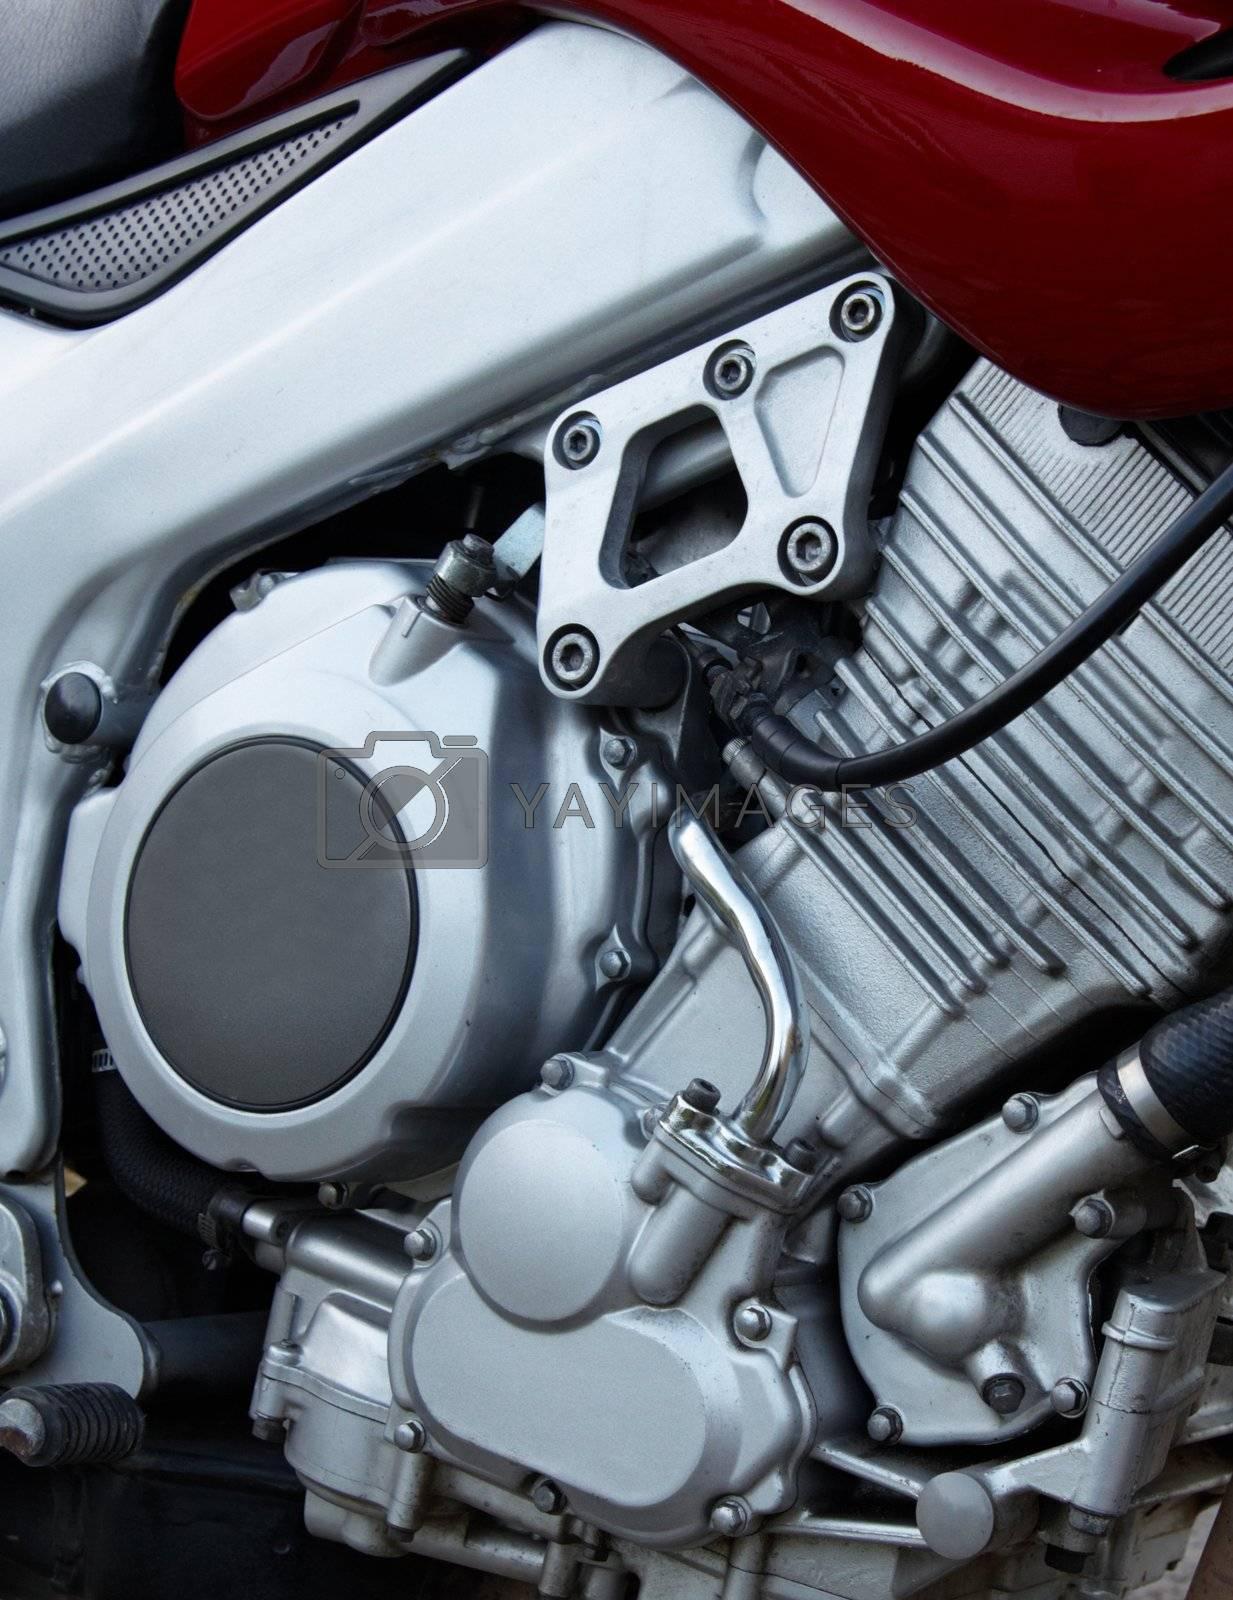 The big motorcycle engine chrome background